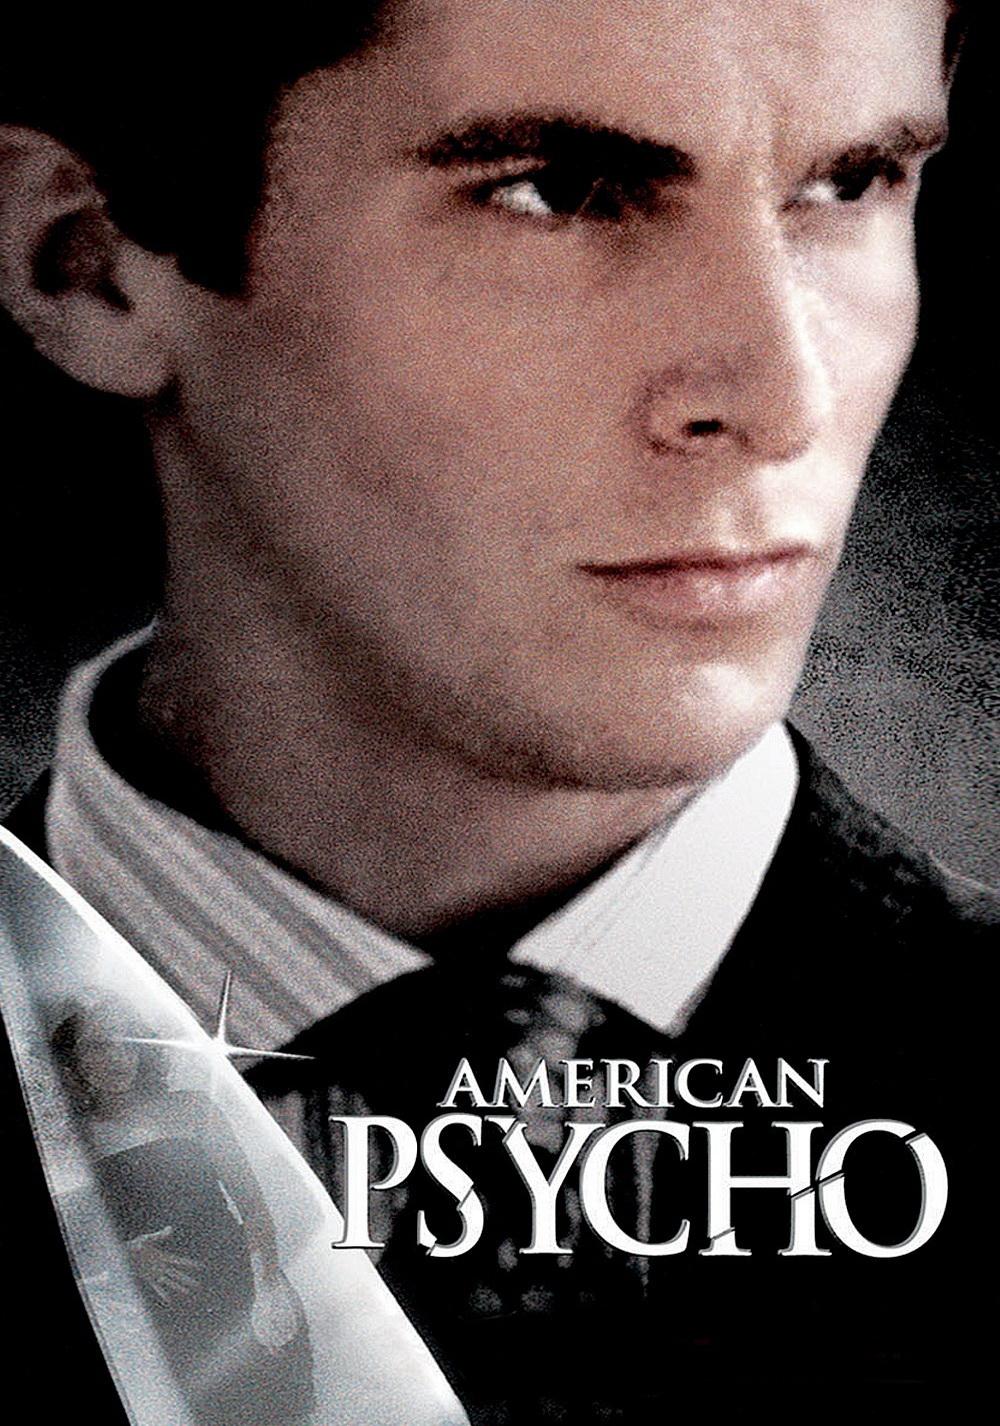 american psycho movie fanart fanarttv